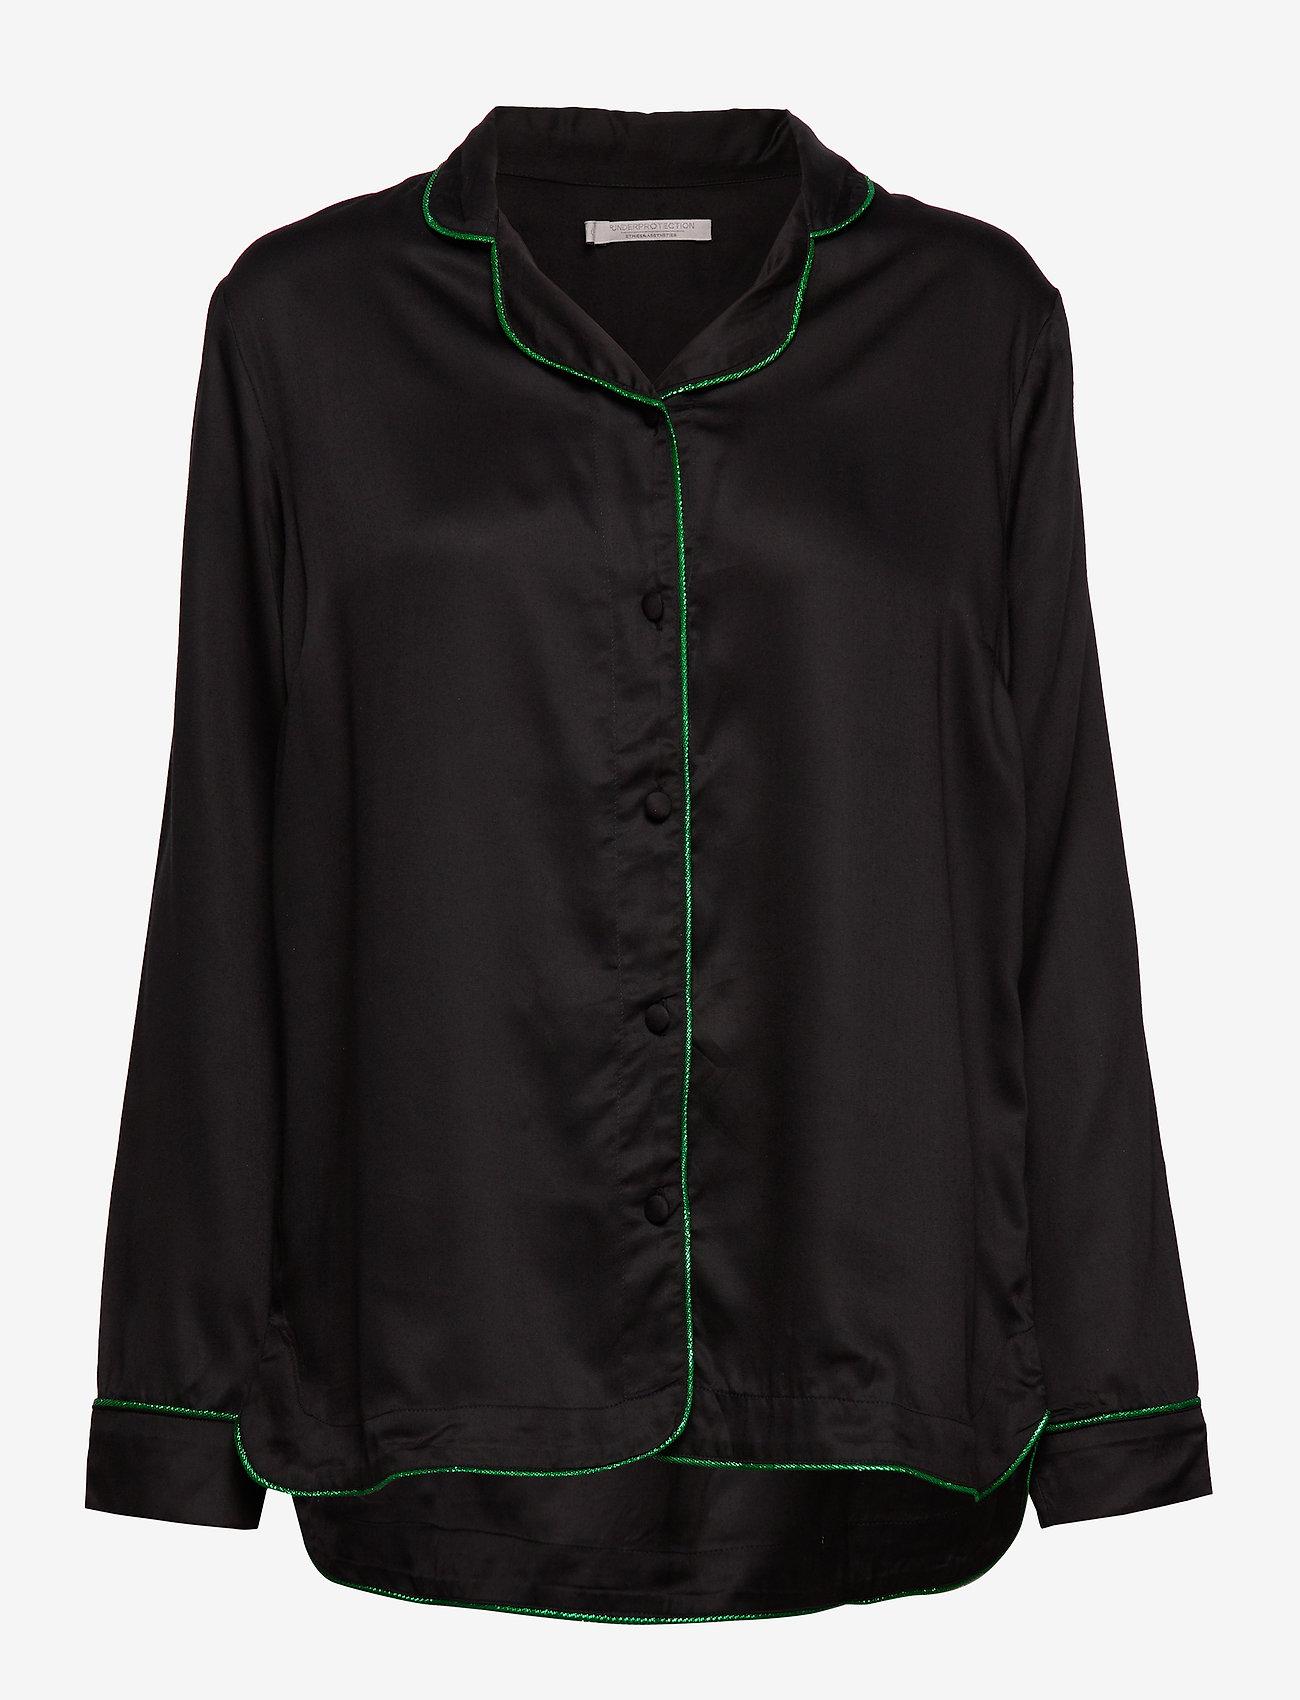 Underprotection - lisa shirt - Överdelar - black - 0